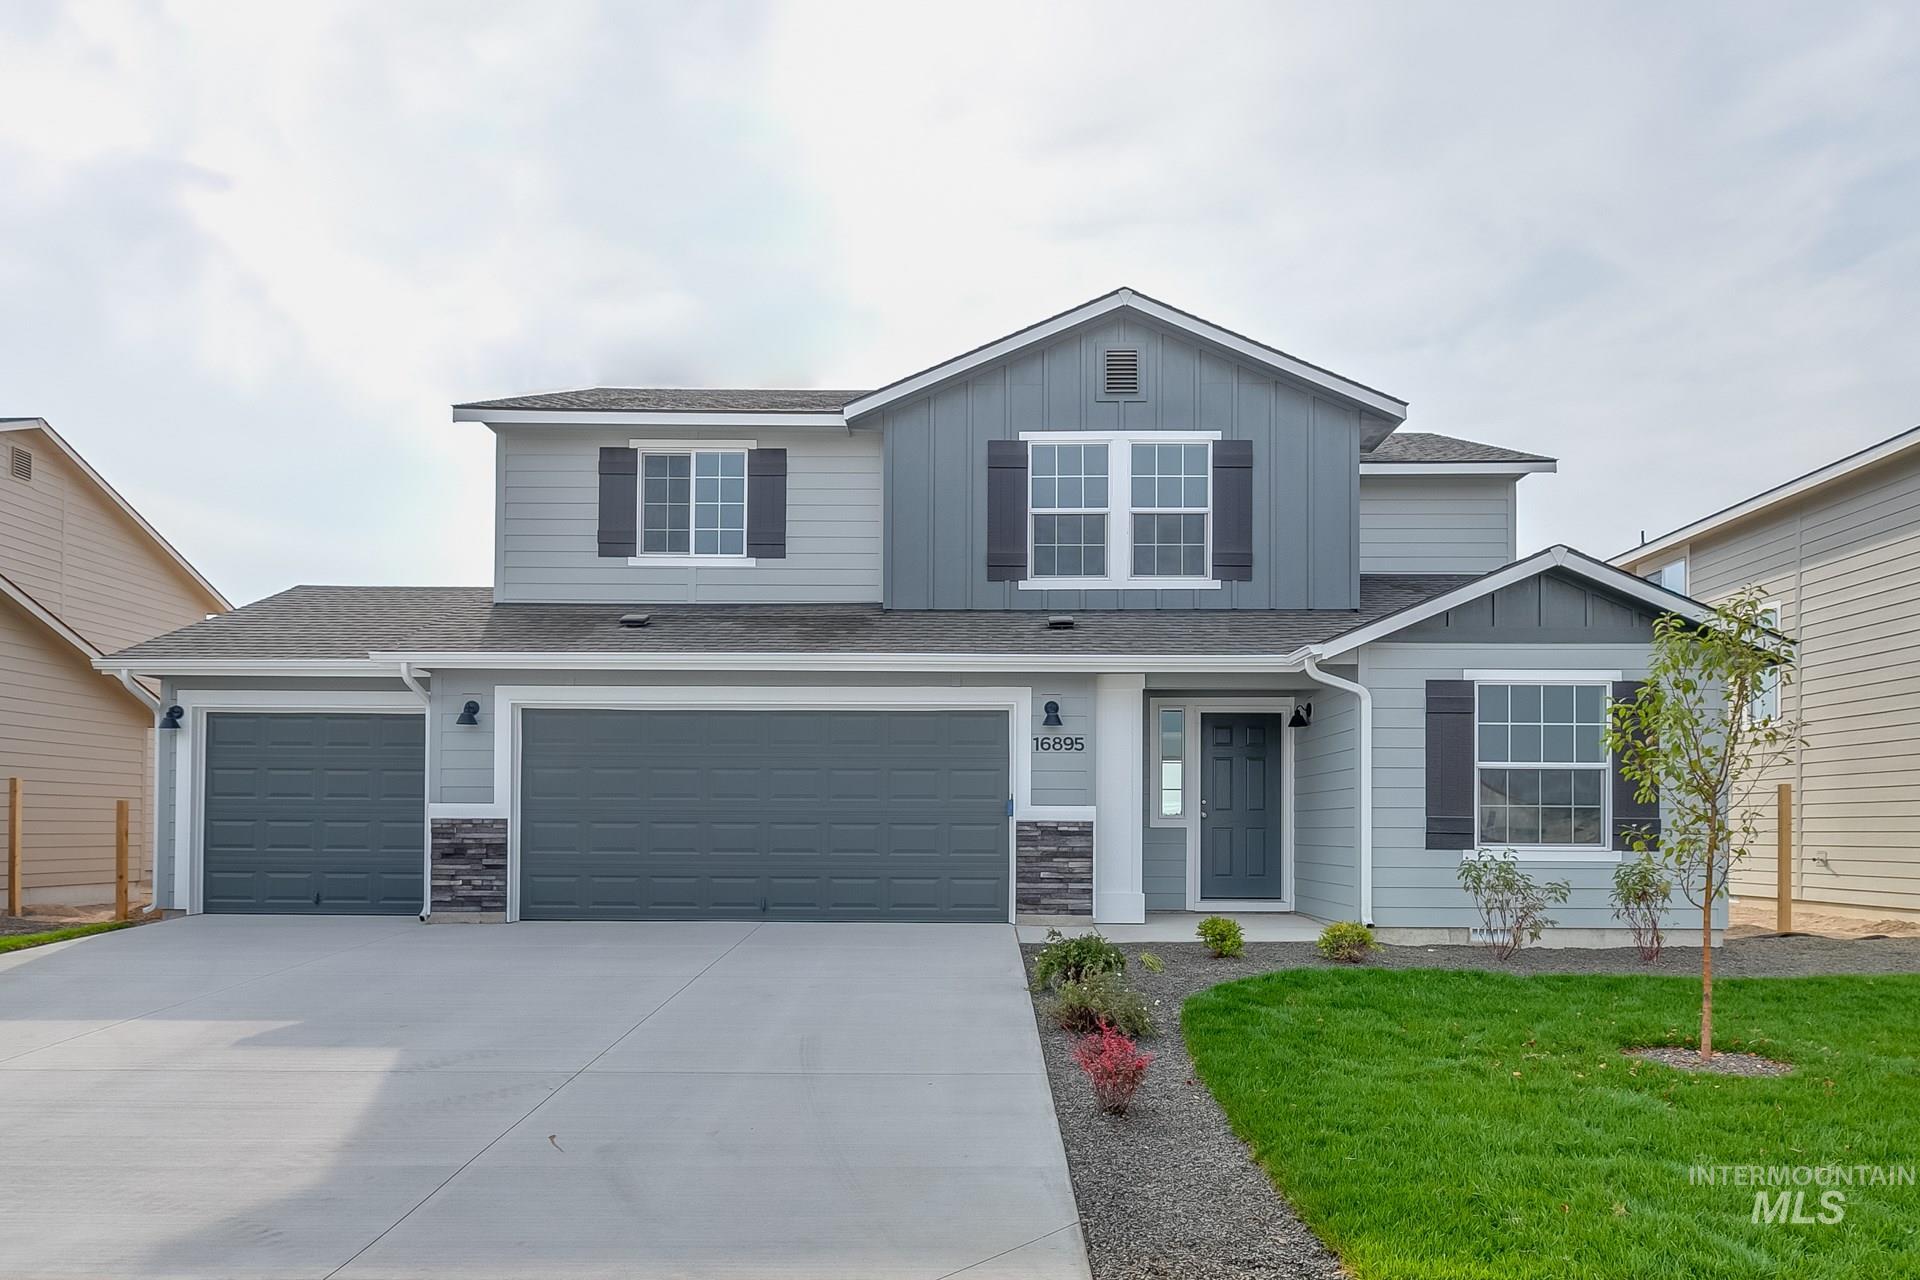 1510 N Rhodamine Pl Property Photo - Kuna, ID real estate listing